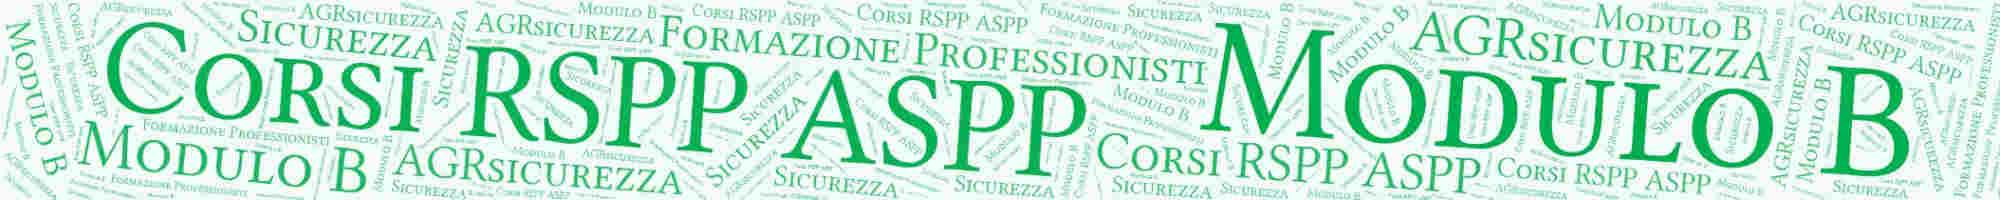 corso modulo b rspp aspp